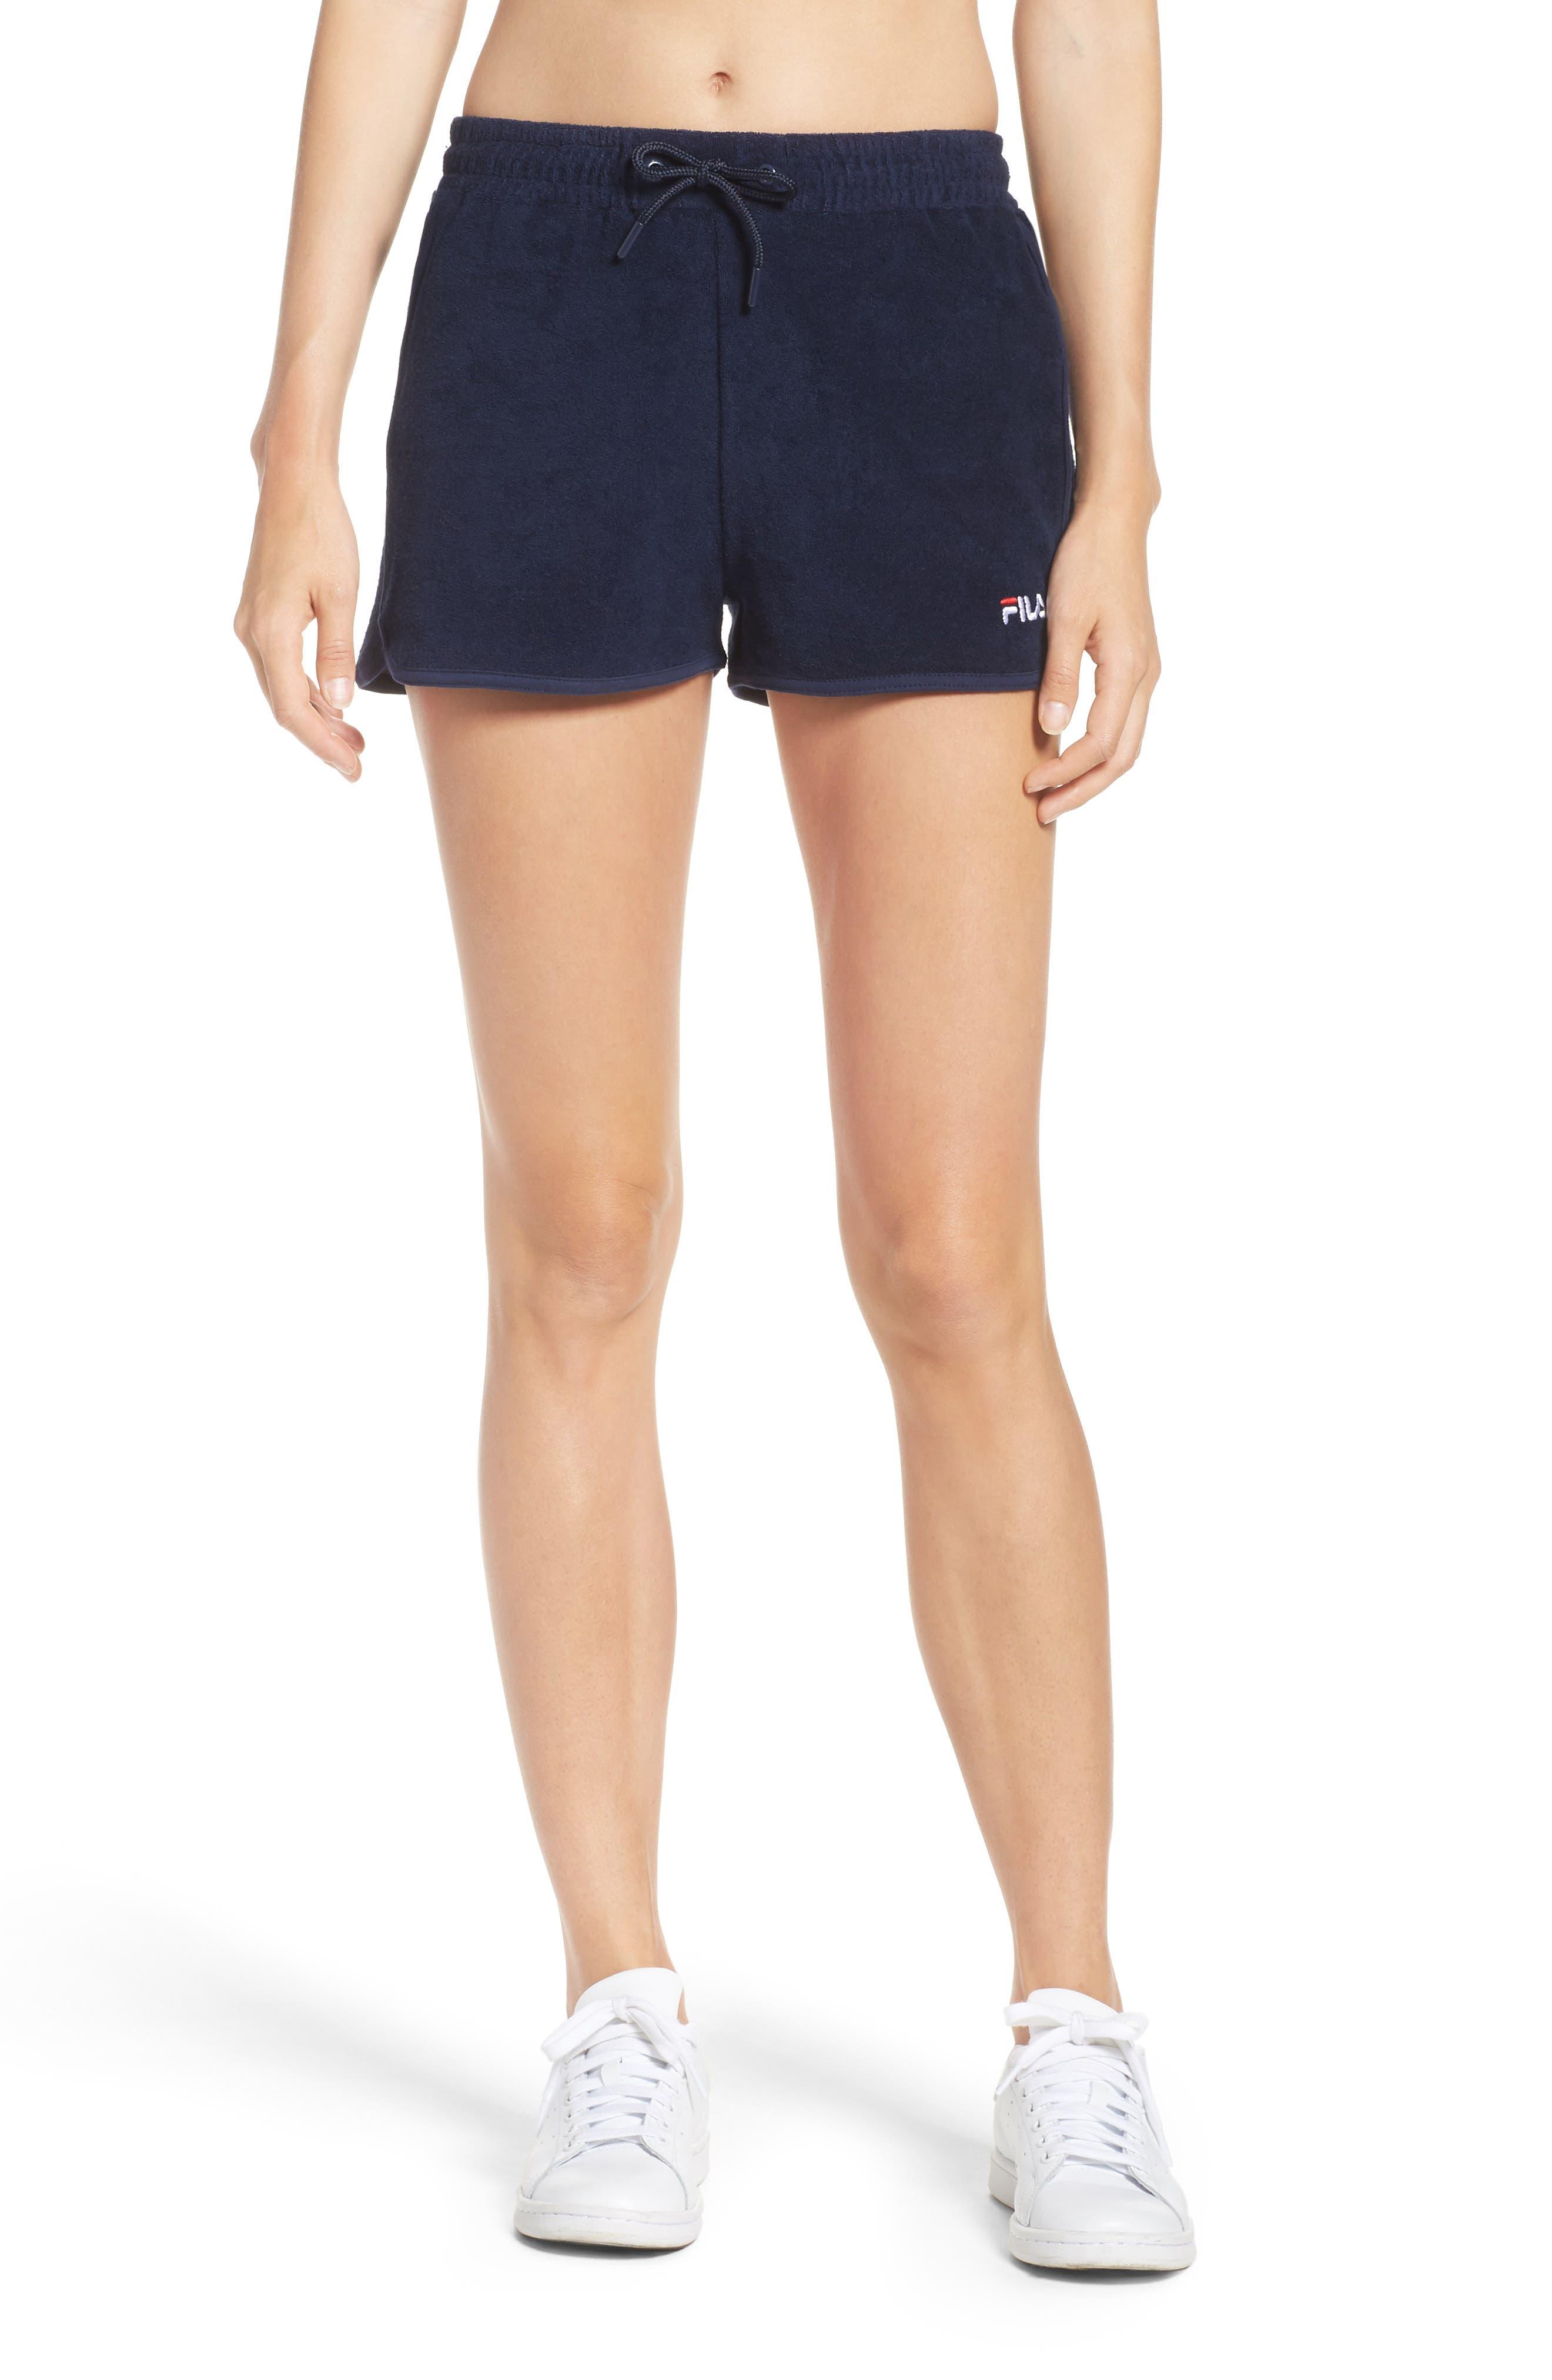 Alternate Image 1 Selected - FILA Follie Shorts